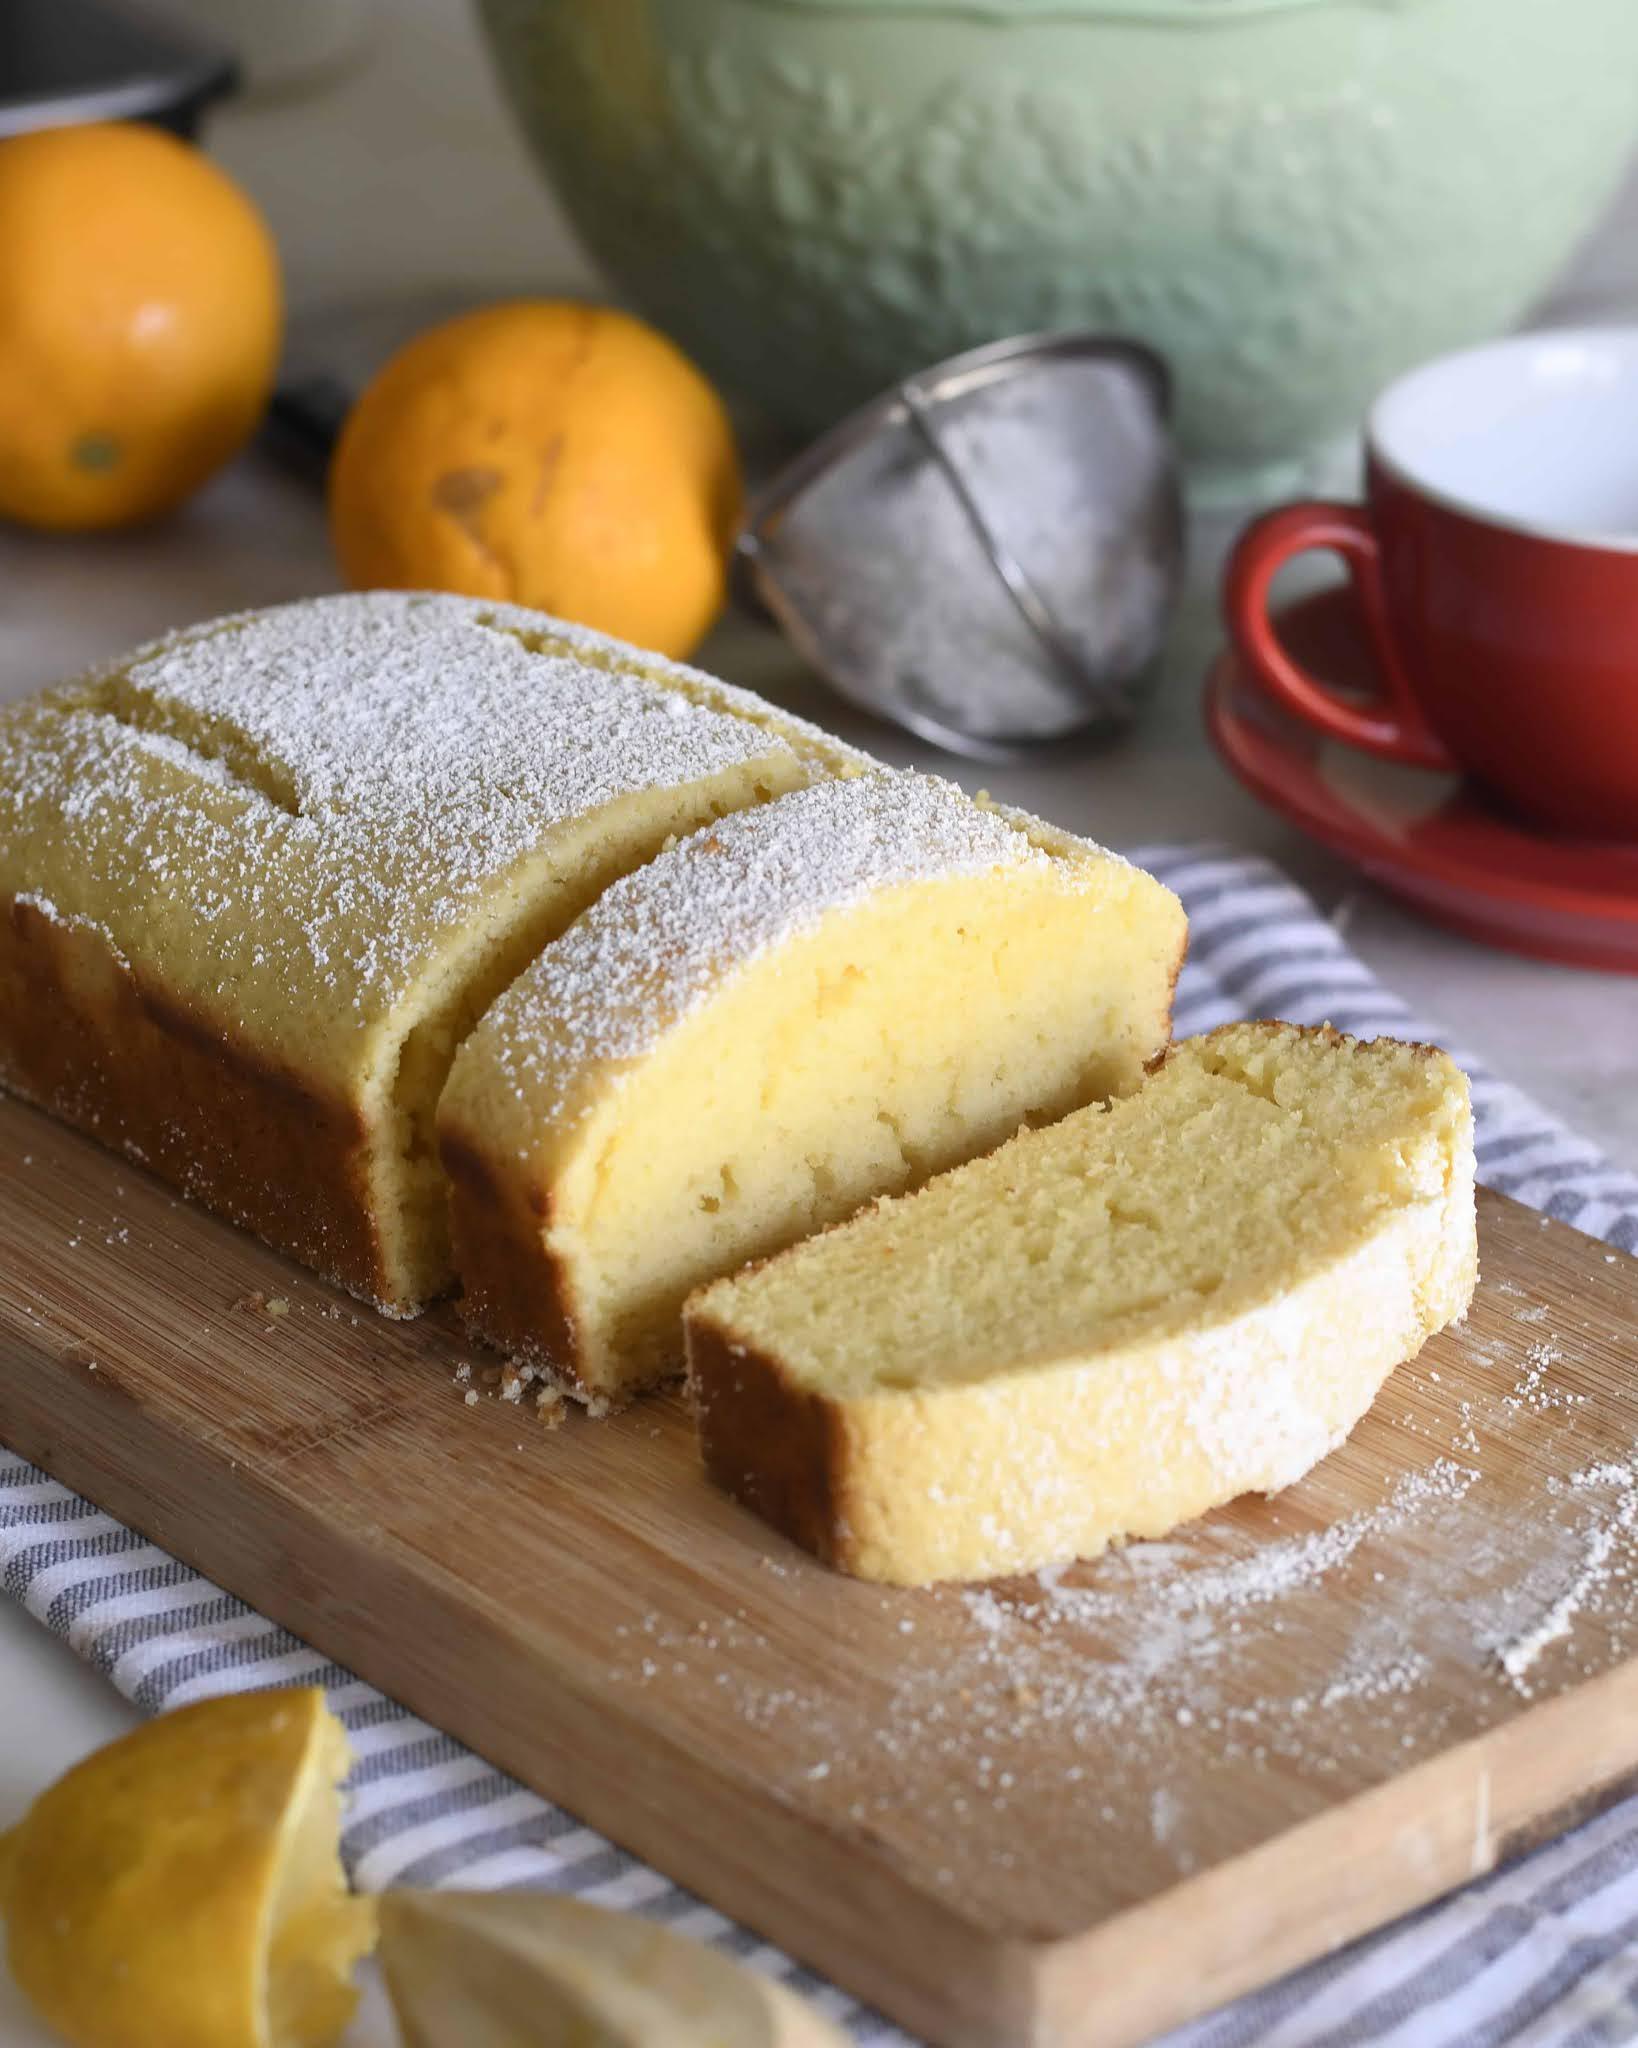 Italian Lemon Plumcake (Pound Cake)